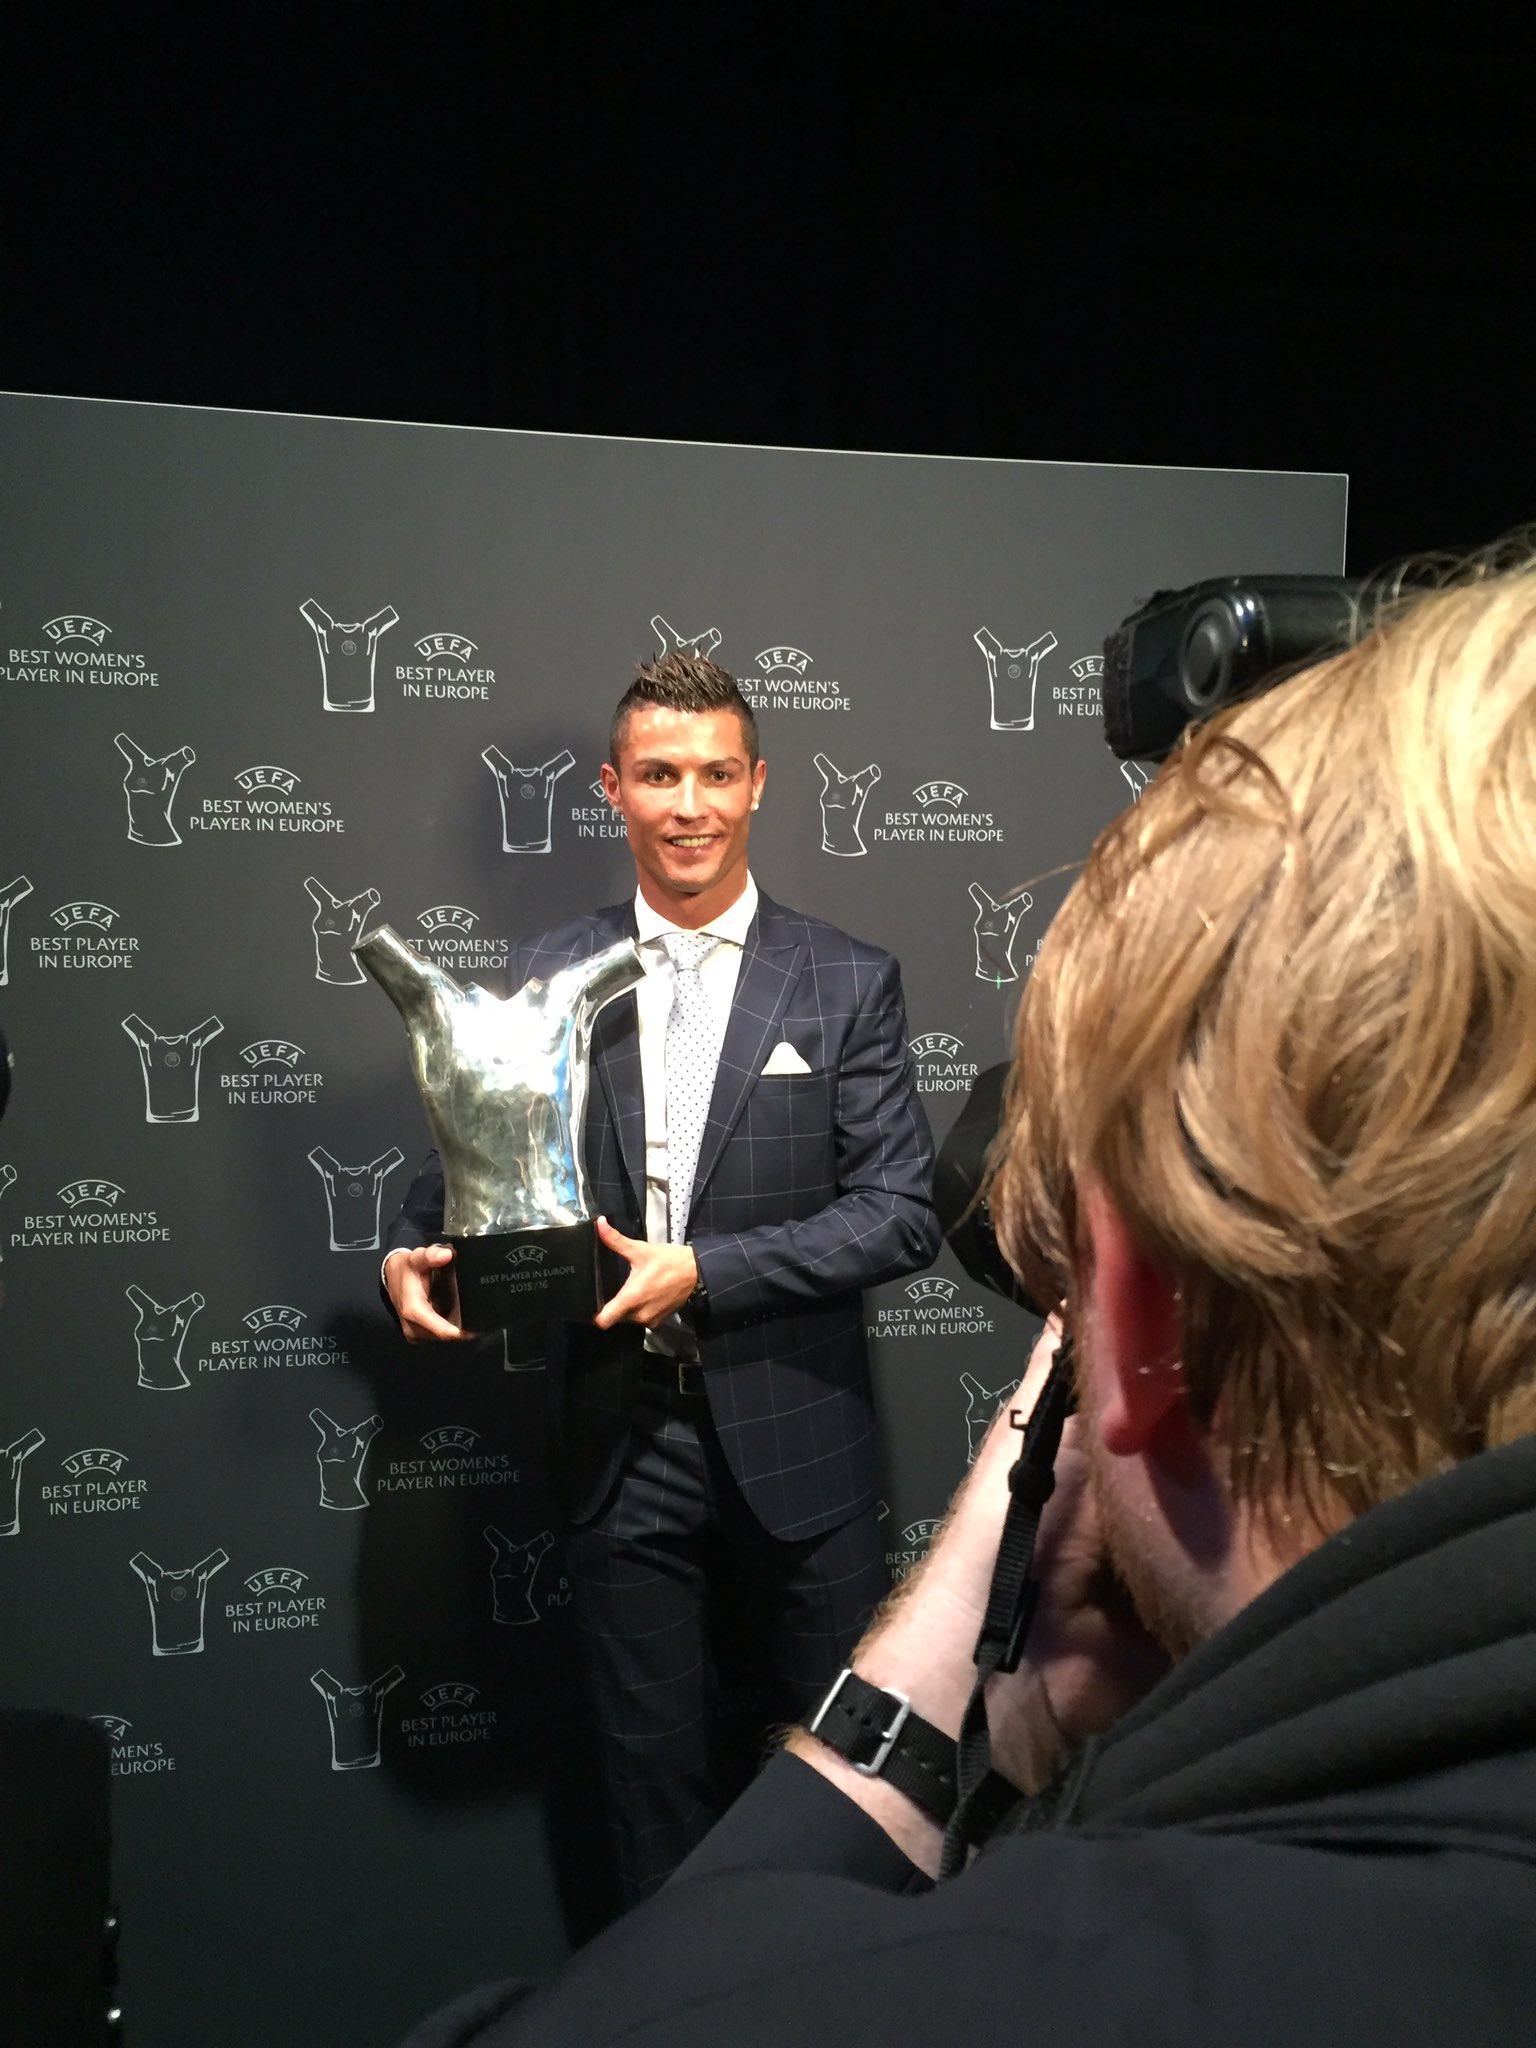 Ronaldo Wins 2nd UEFA Best Player In Europe Award